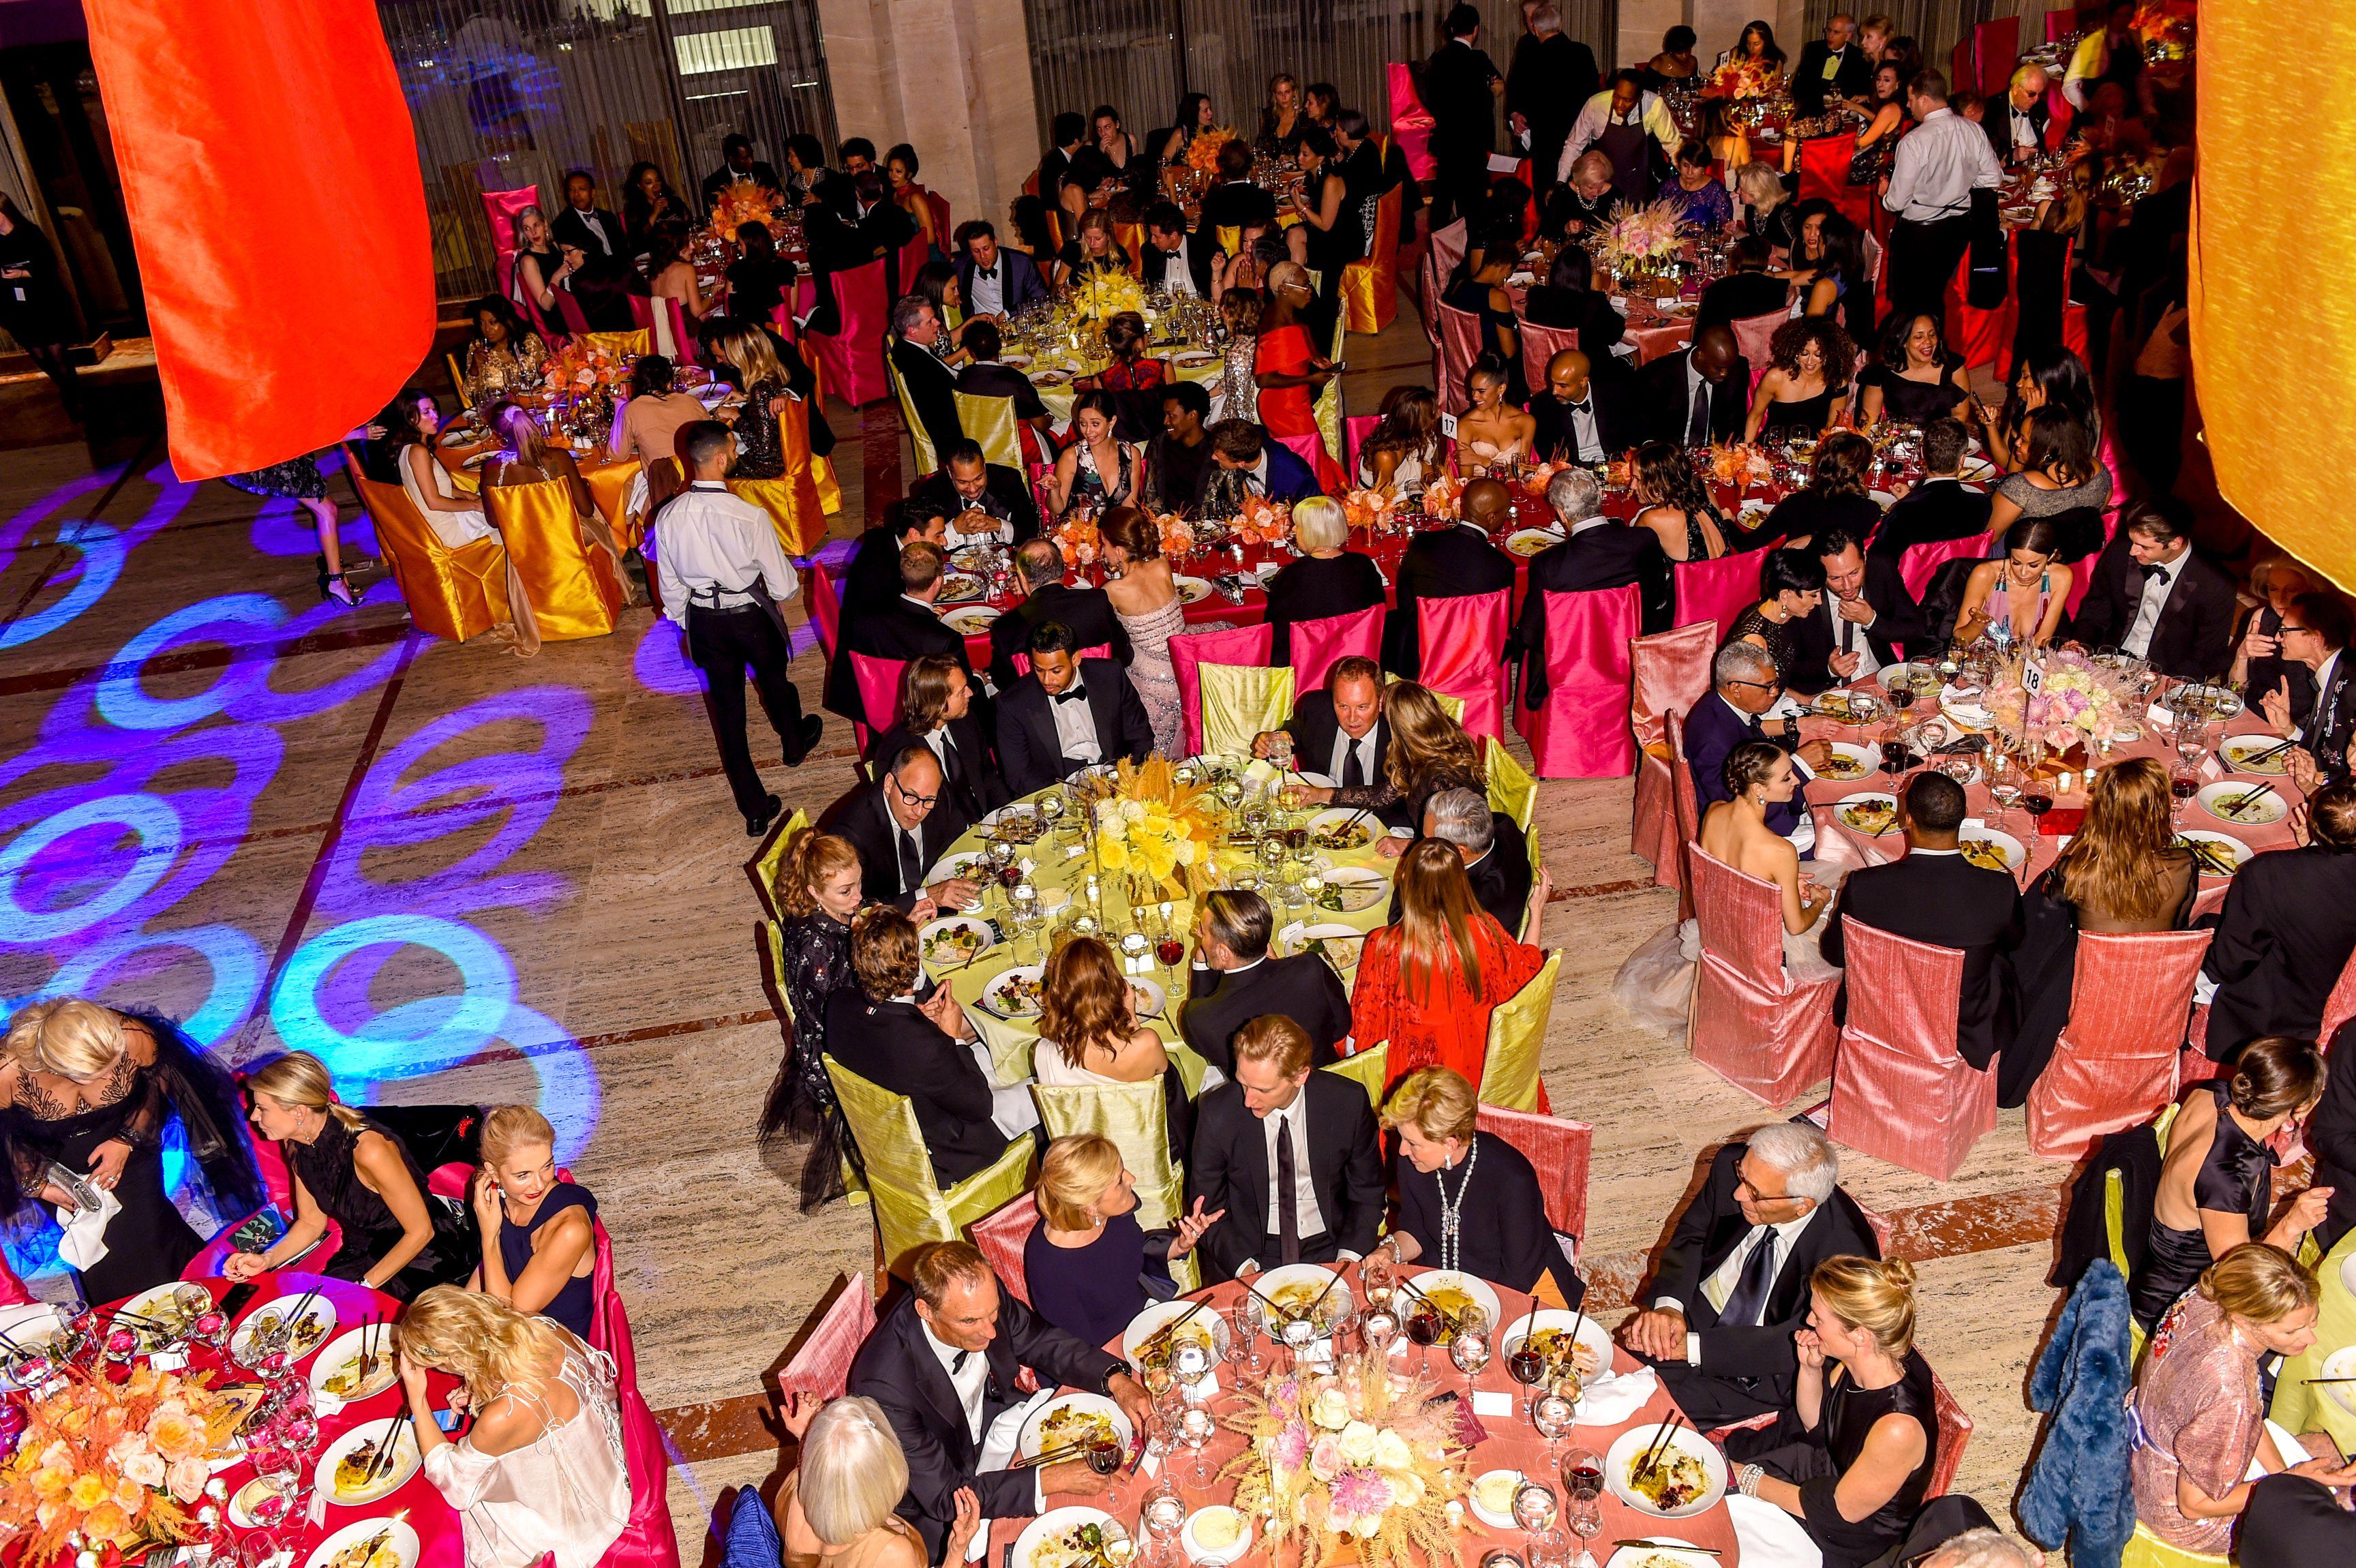 AtmosphereAmerican Ballet Theatre Fall Gala, New York, USA - 18 Oct 2017